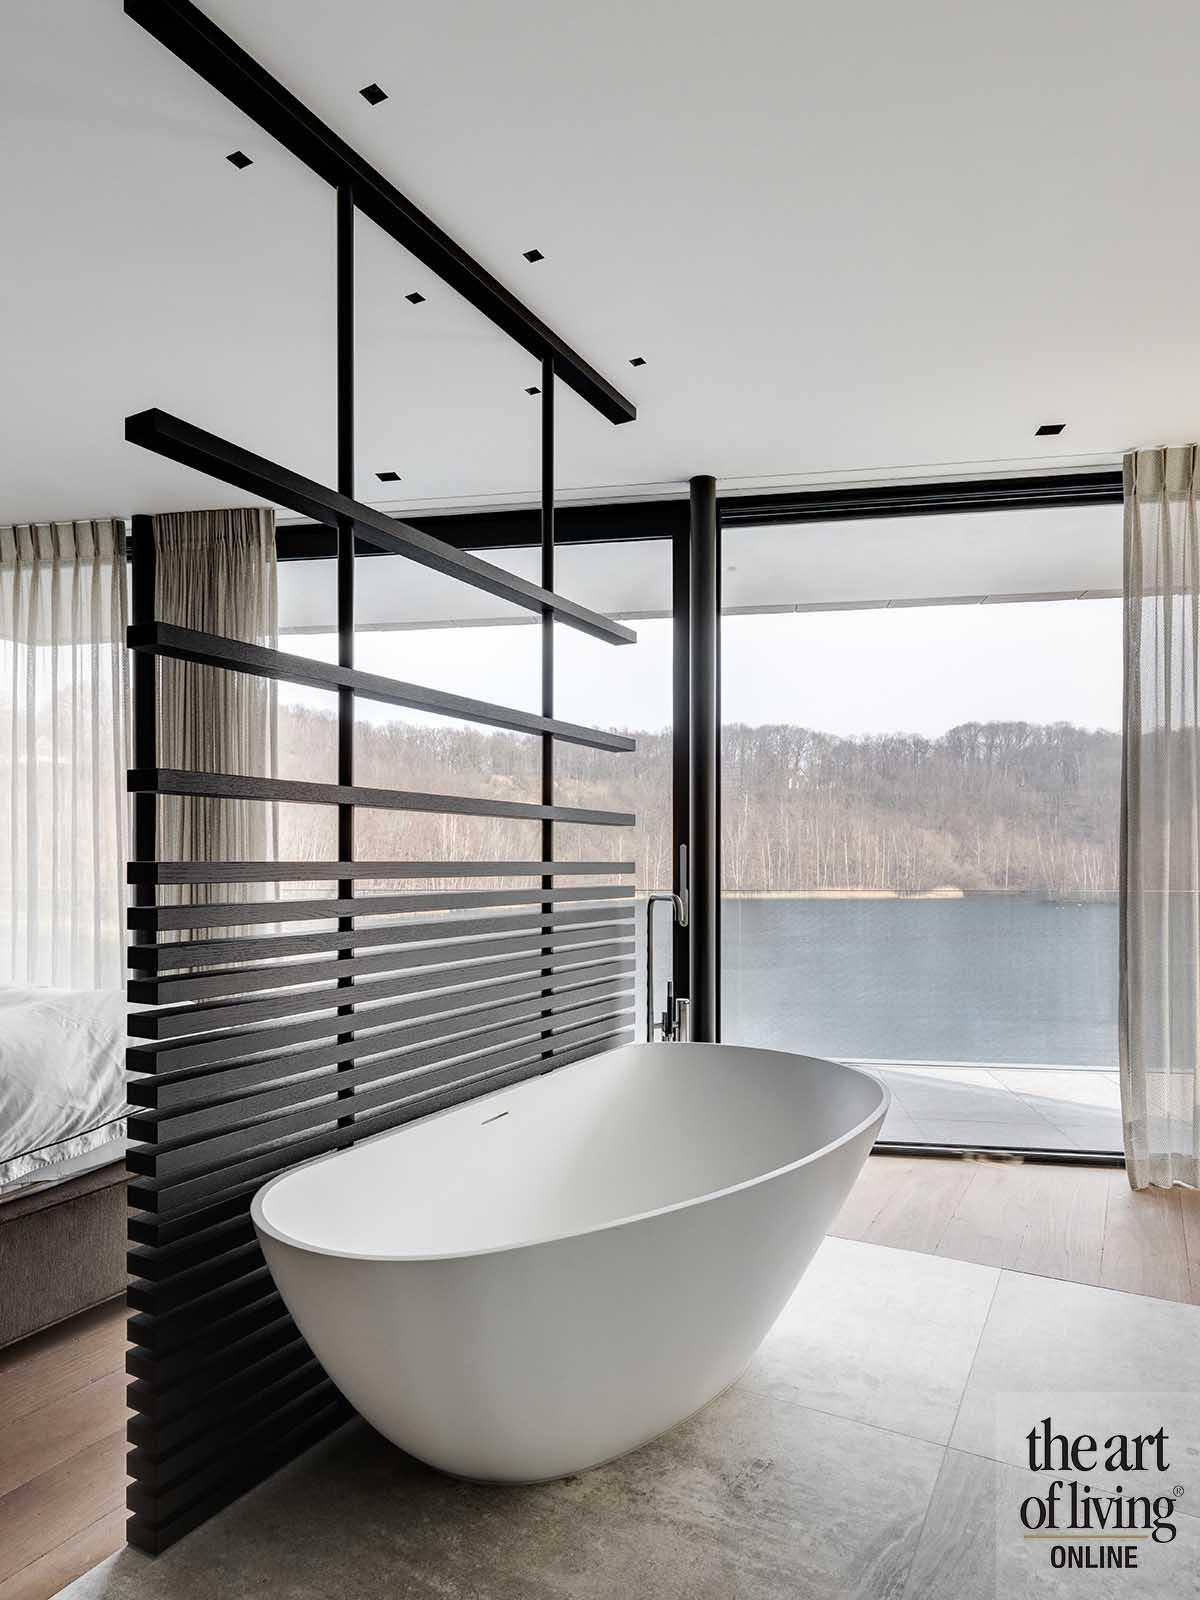 Duurzame villa | Mix Architectuur , the art of living